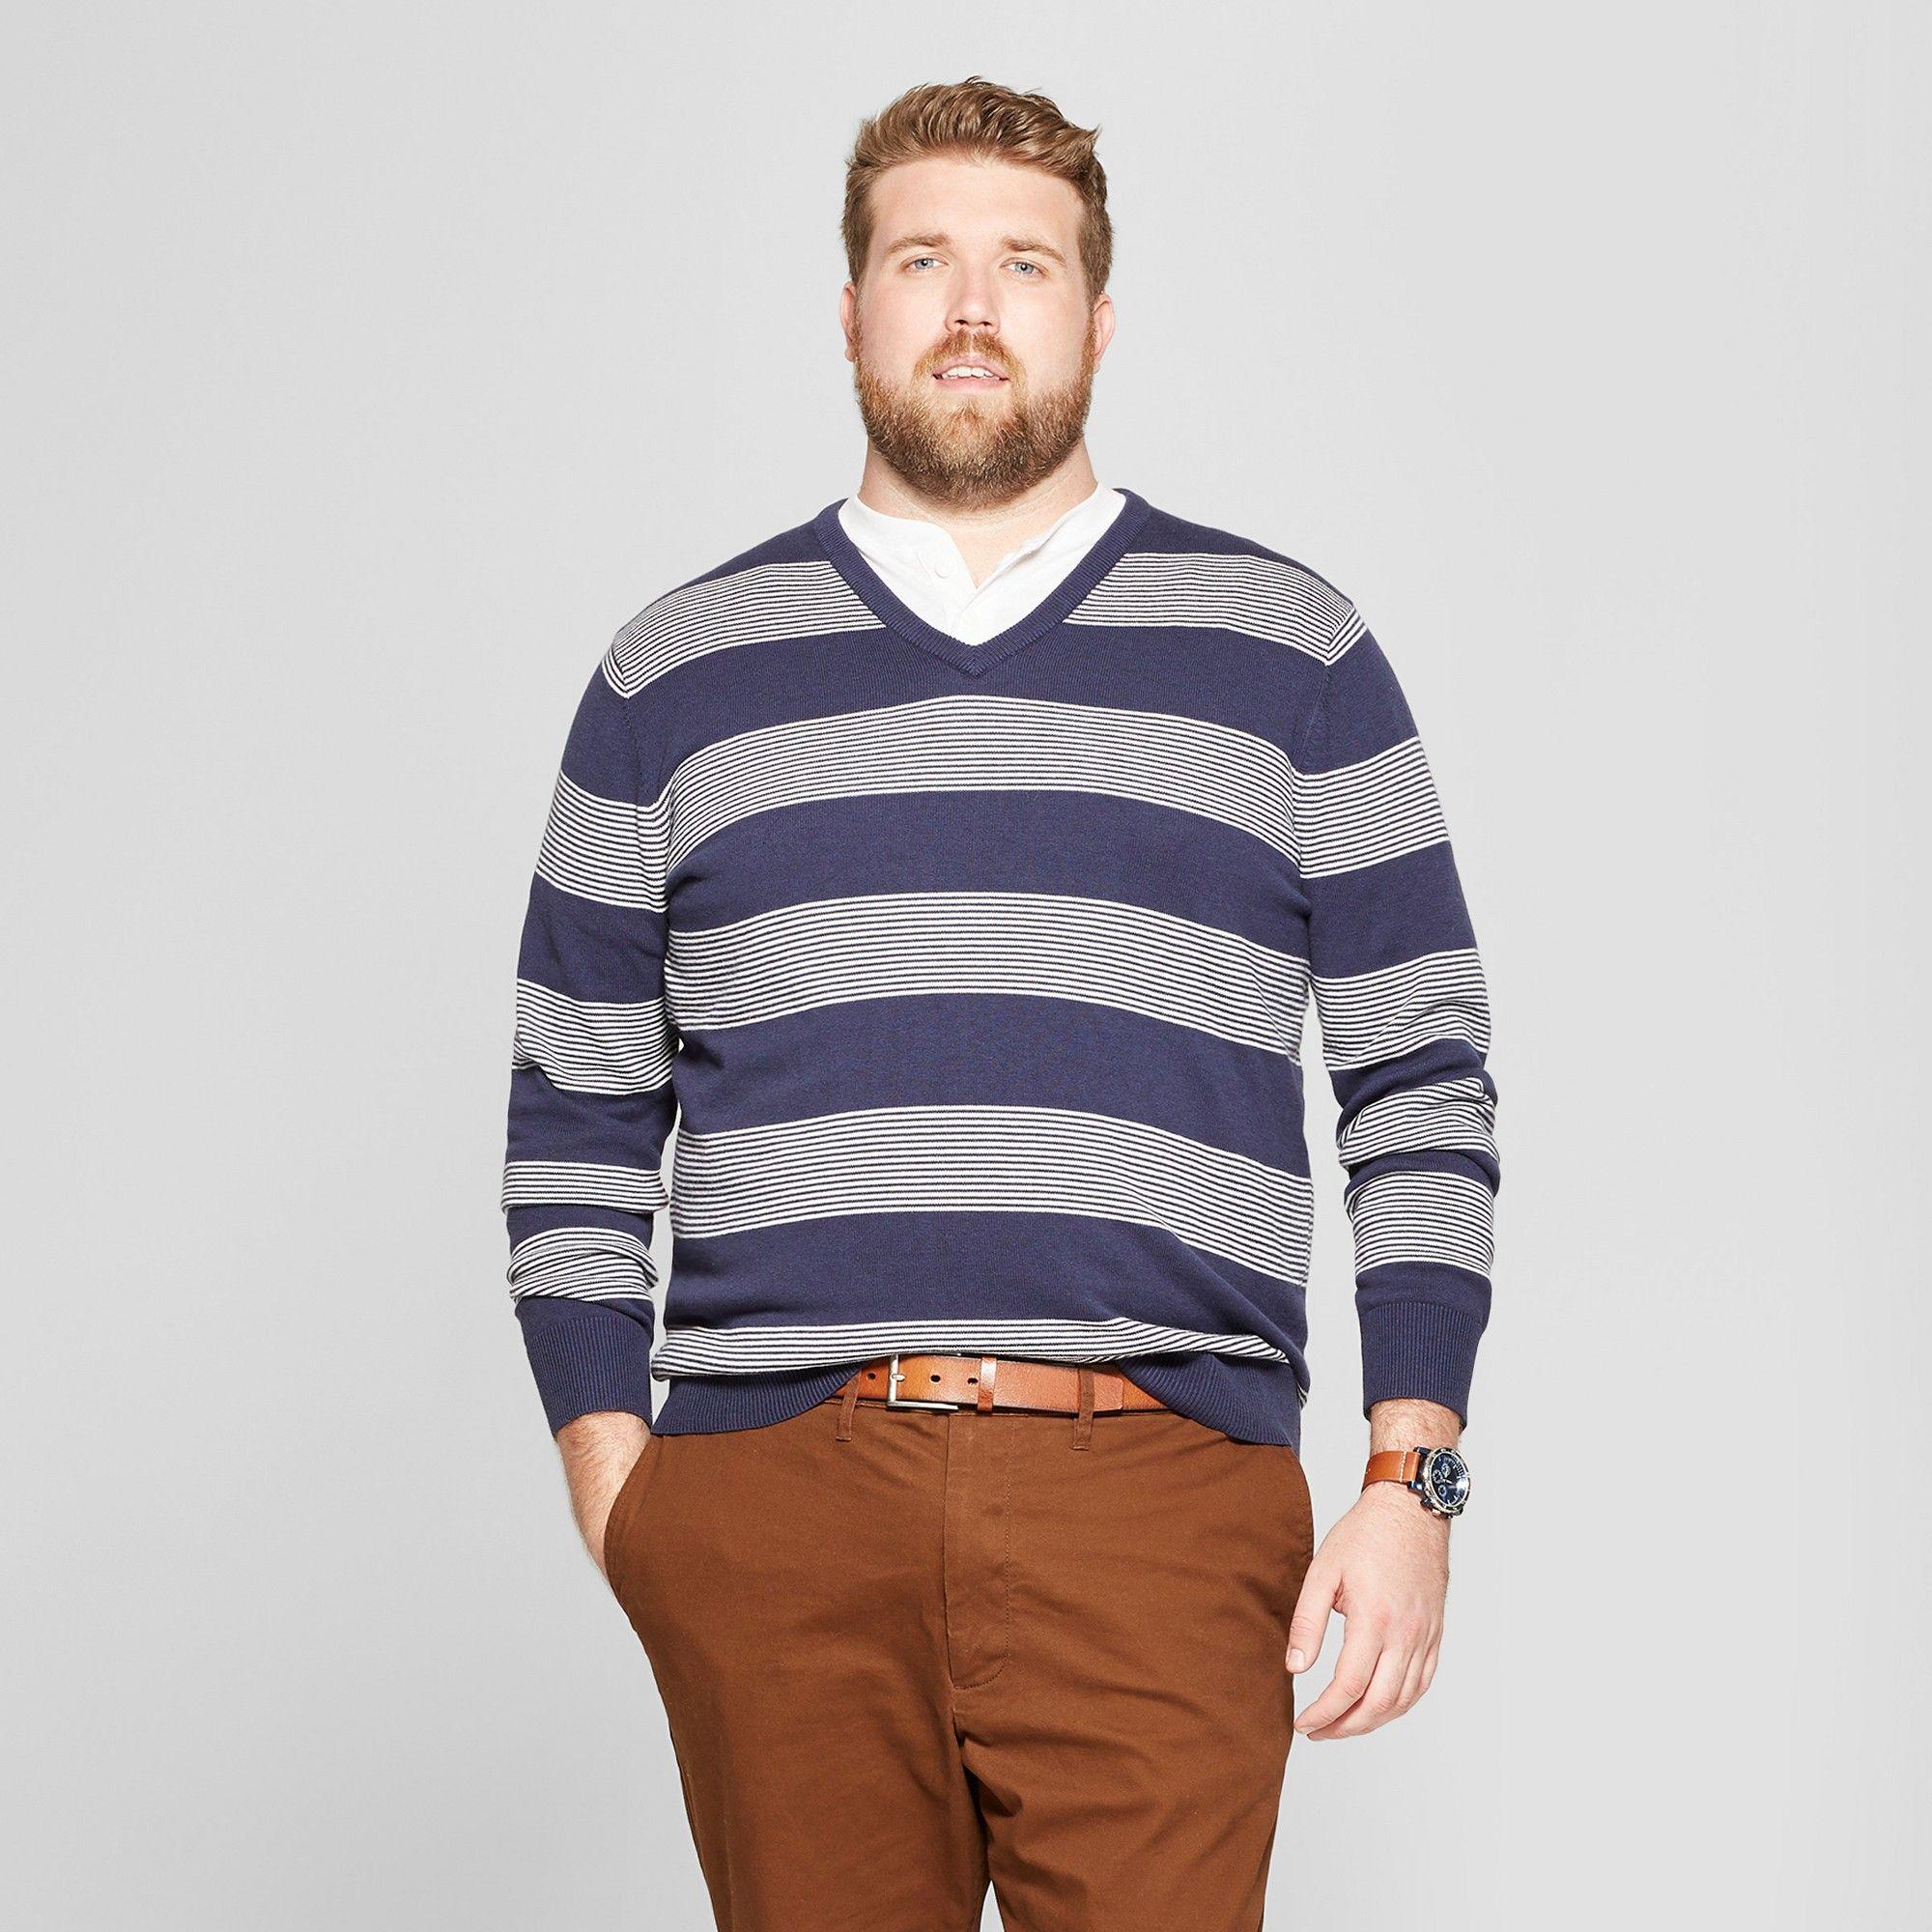 e07063829477b Men s Big   Tall Striped Crew Neck Sweater - Goodfellow   Co Navy Heather  2XBT